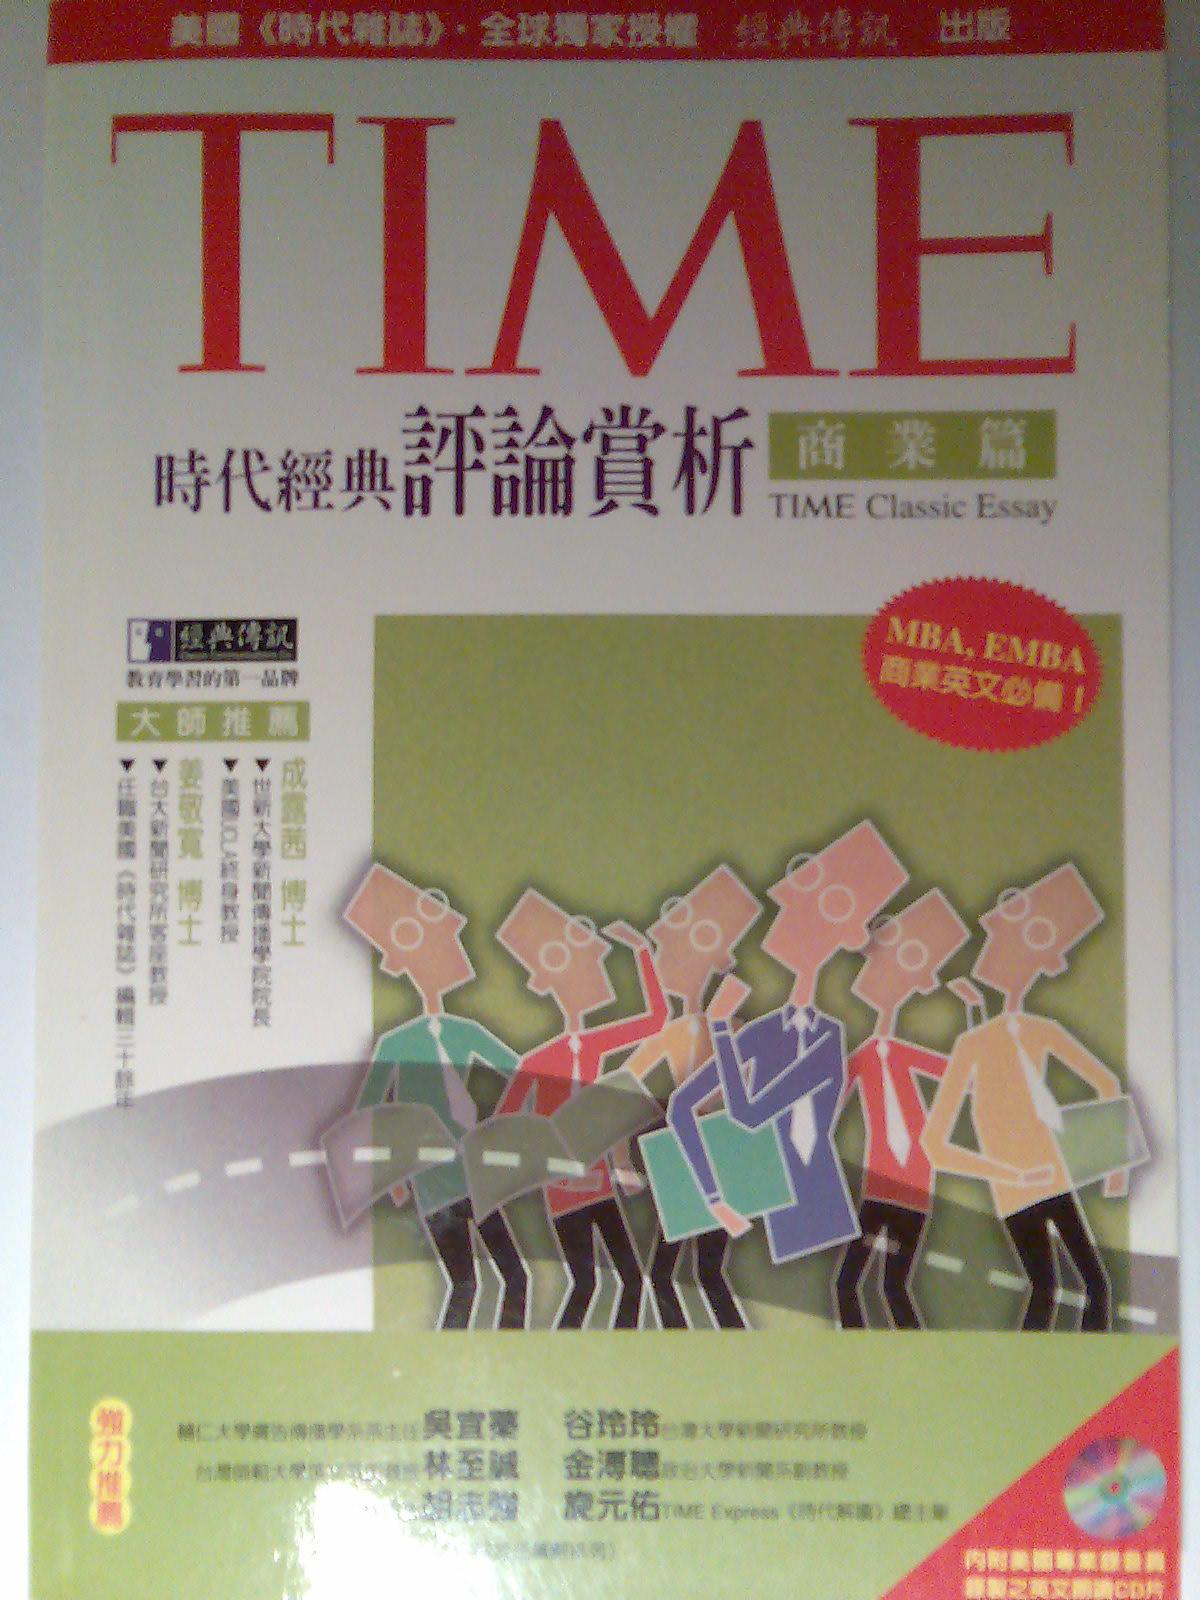 TIME時代經典評論賞析